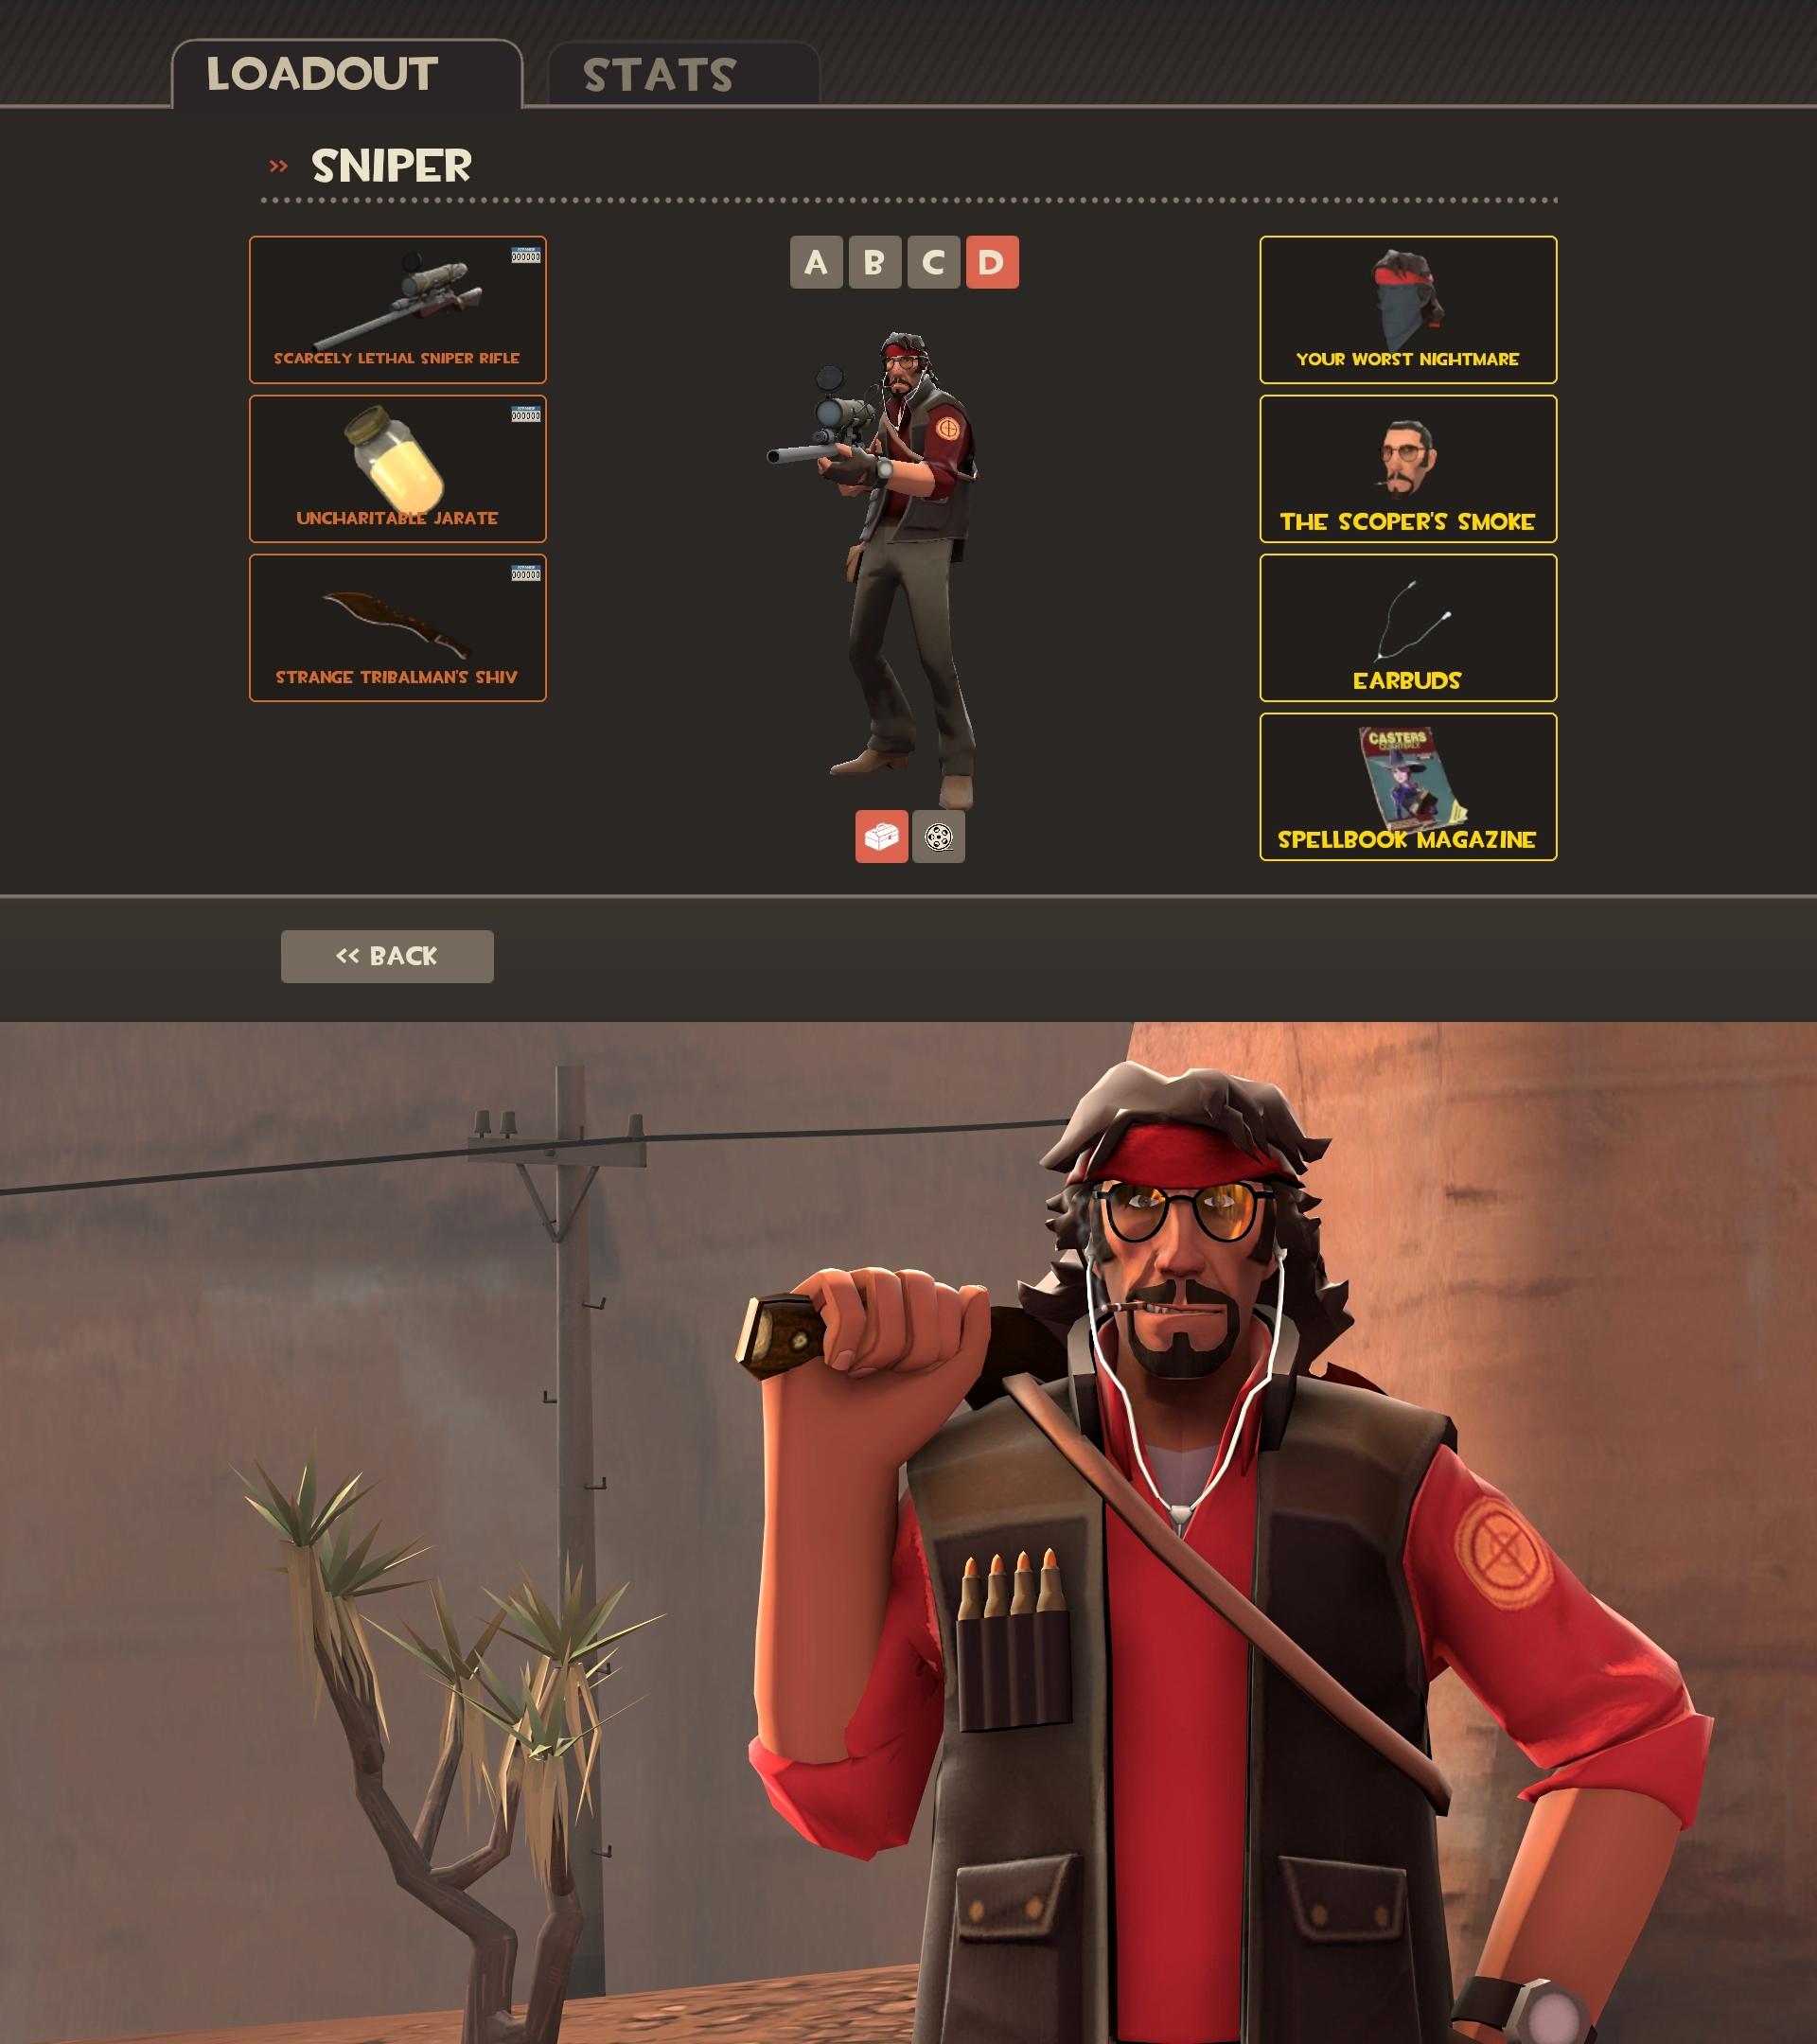 New TF2 Sniper Loadout! by Cowboygineer on DeviantArt